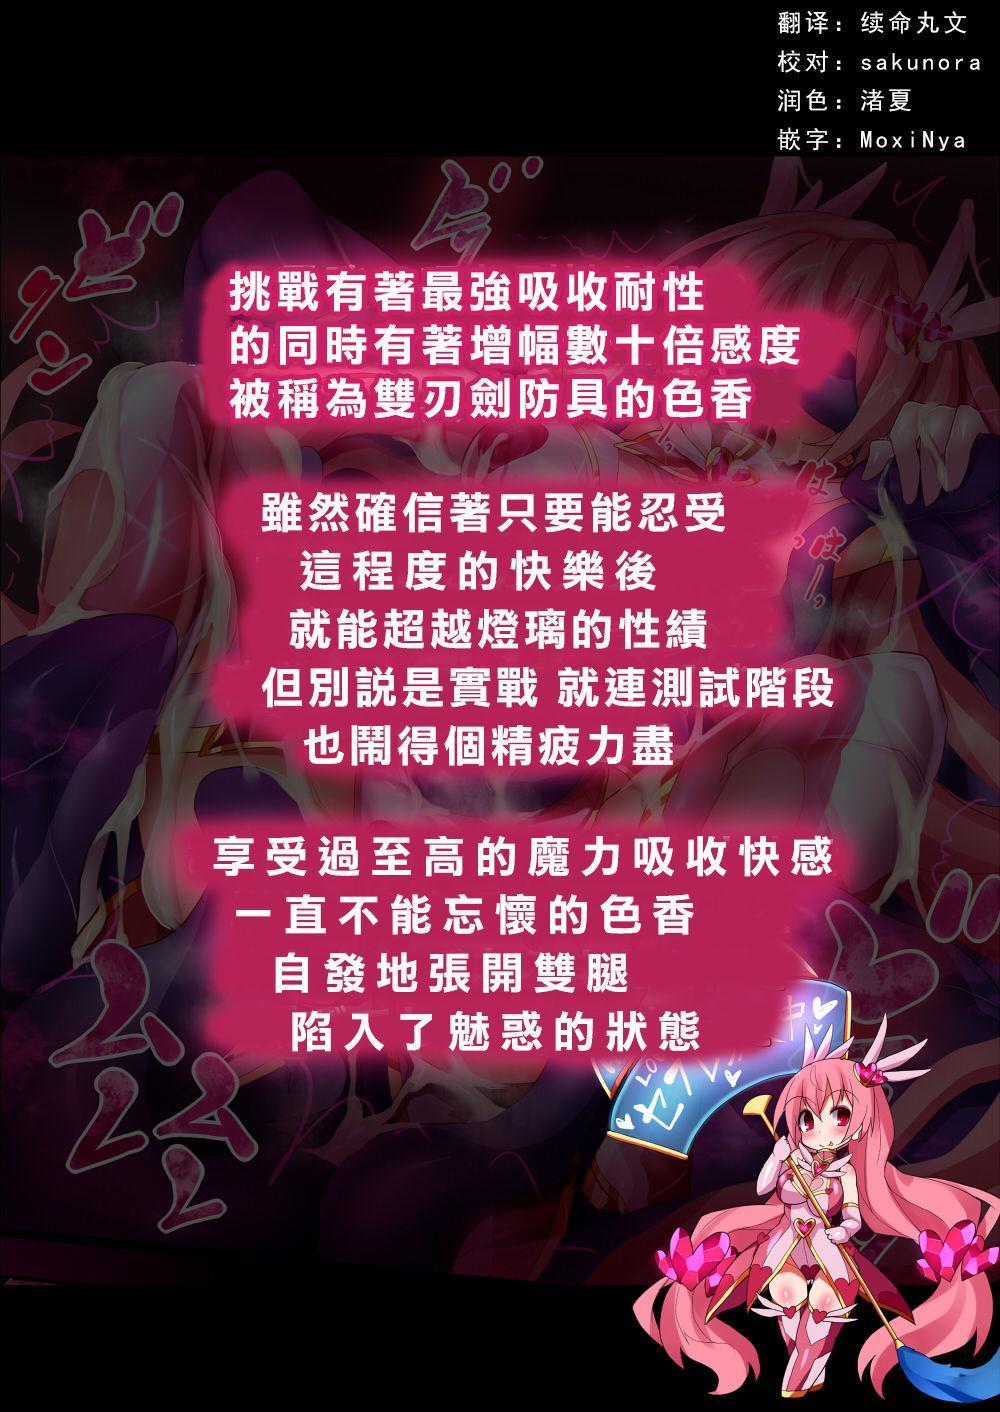 [Makutsutei (Nagai Wataru)] Orgasm Unit EX -Mahou Senshi Akari Ch. 1-5 [Chinese] [这很恶堕 x Lolipoi汉化组] 33